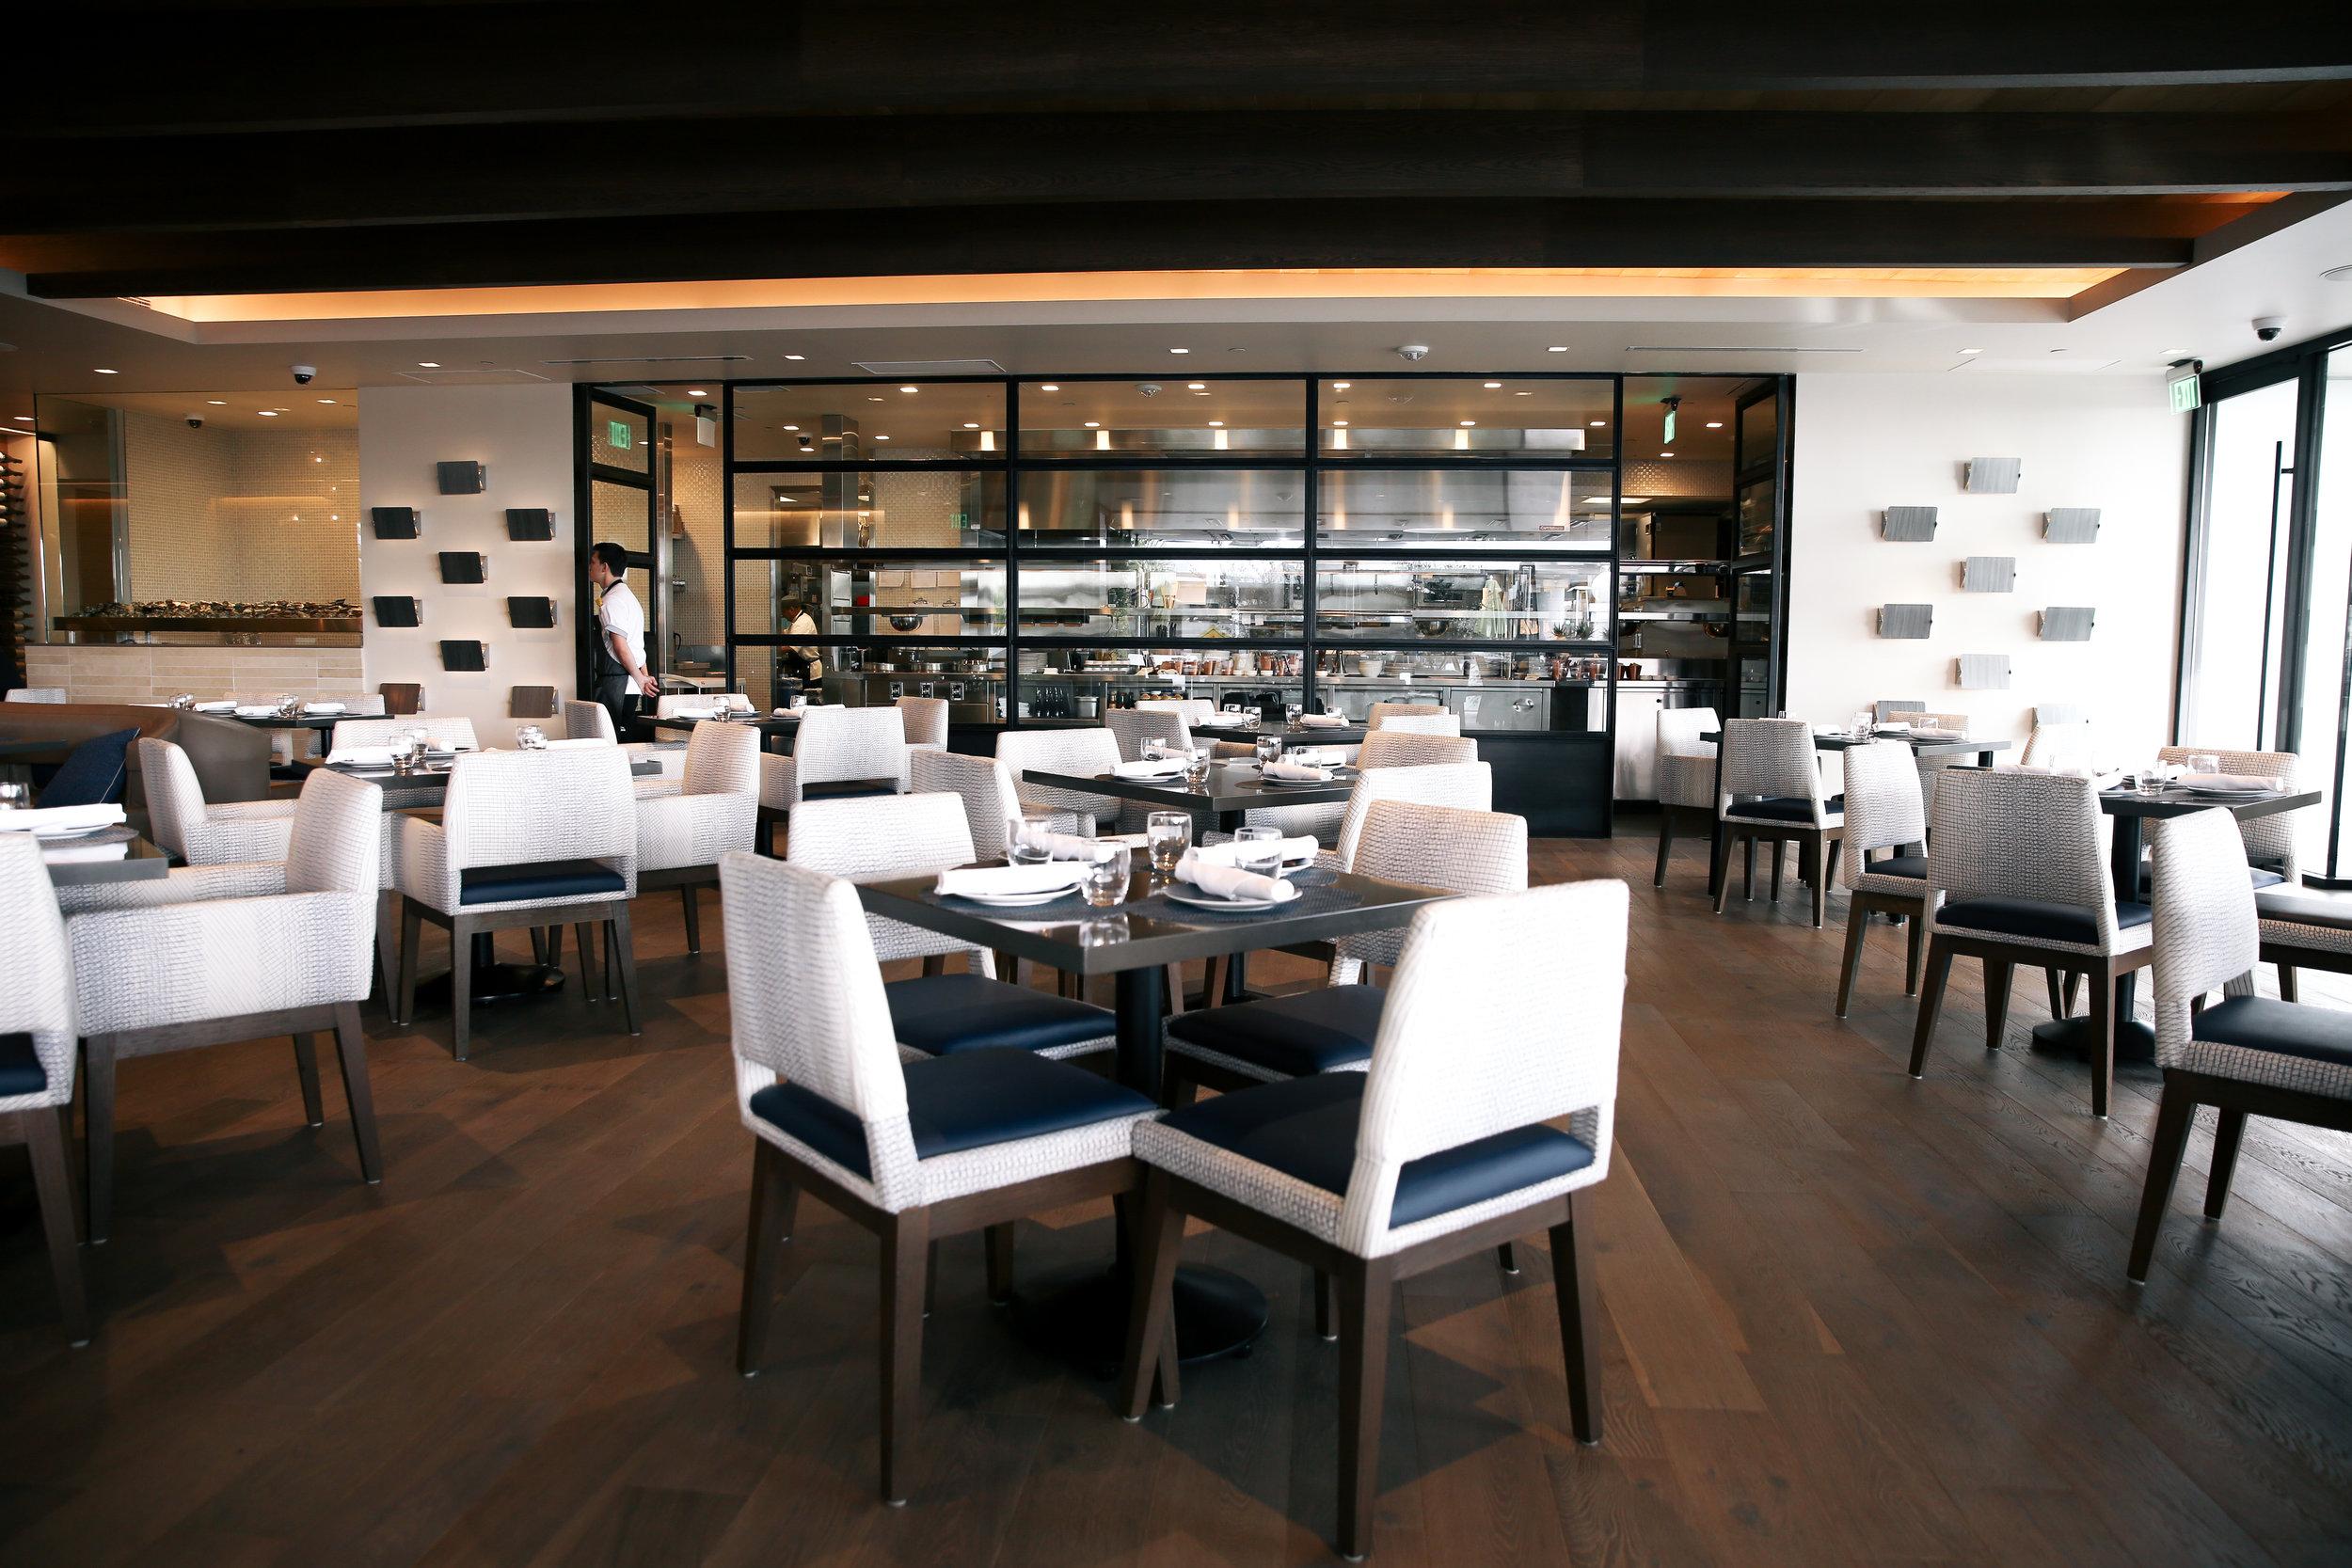 dining room interior decor at Bottlefish Los Angeles via The Style Sauce blog